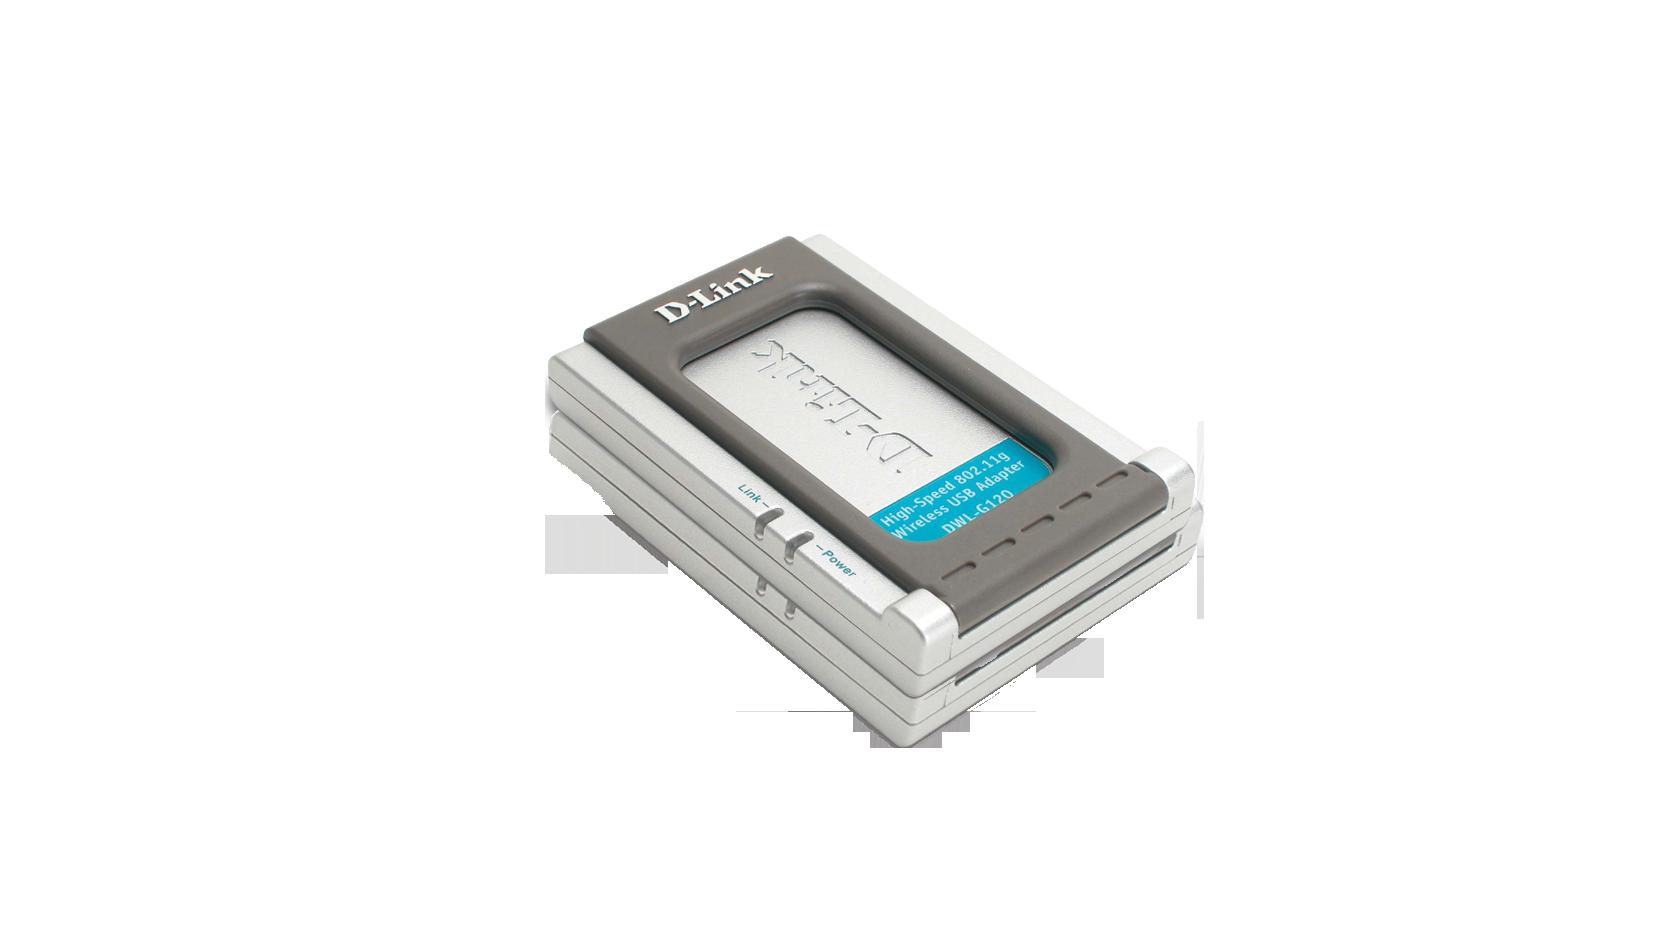 802 11g Wireless Network Diagram Wiring Libraries Lan Dwl G120 Usb Adapter D Link Uk